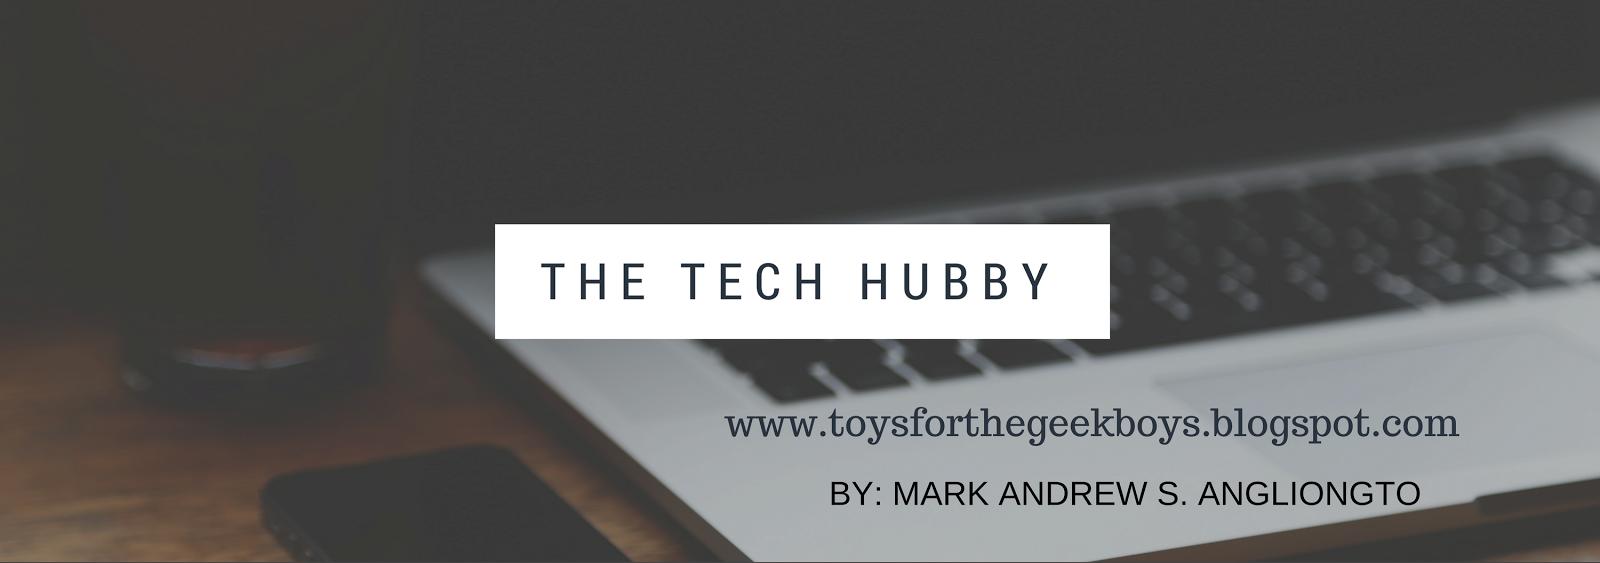 The Tech Hubby